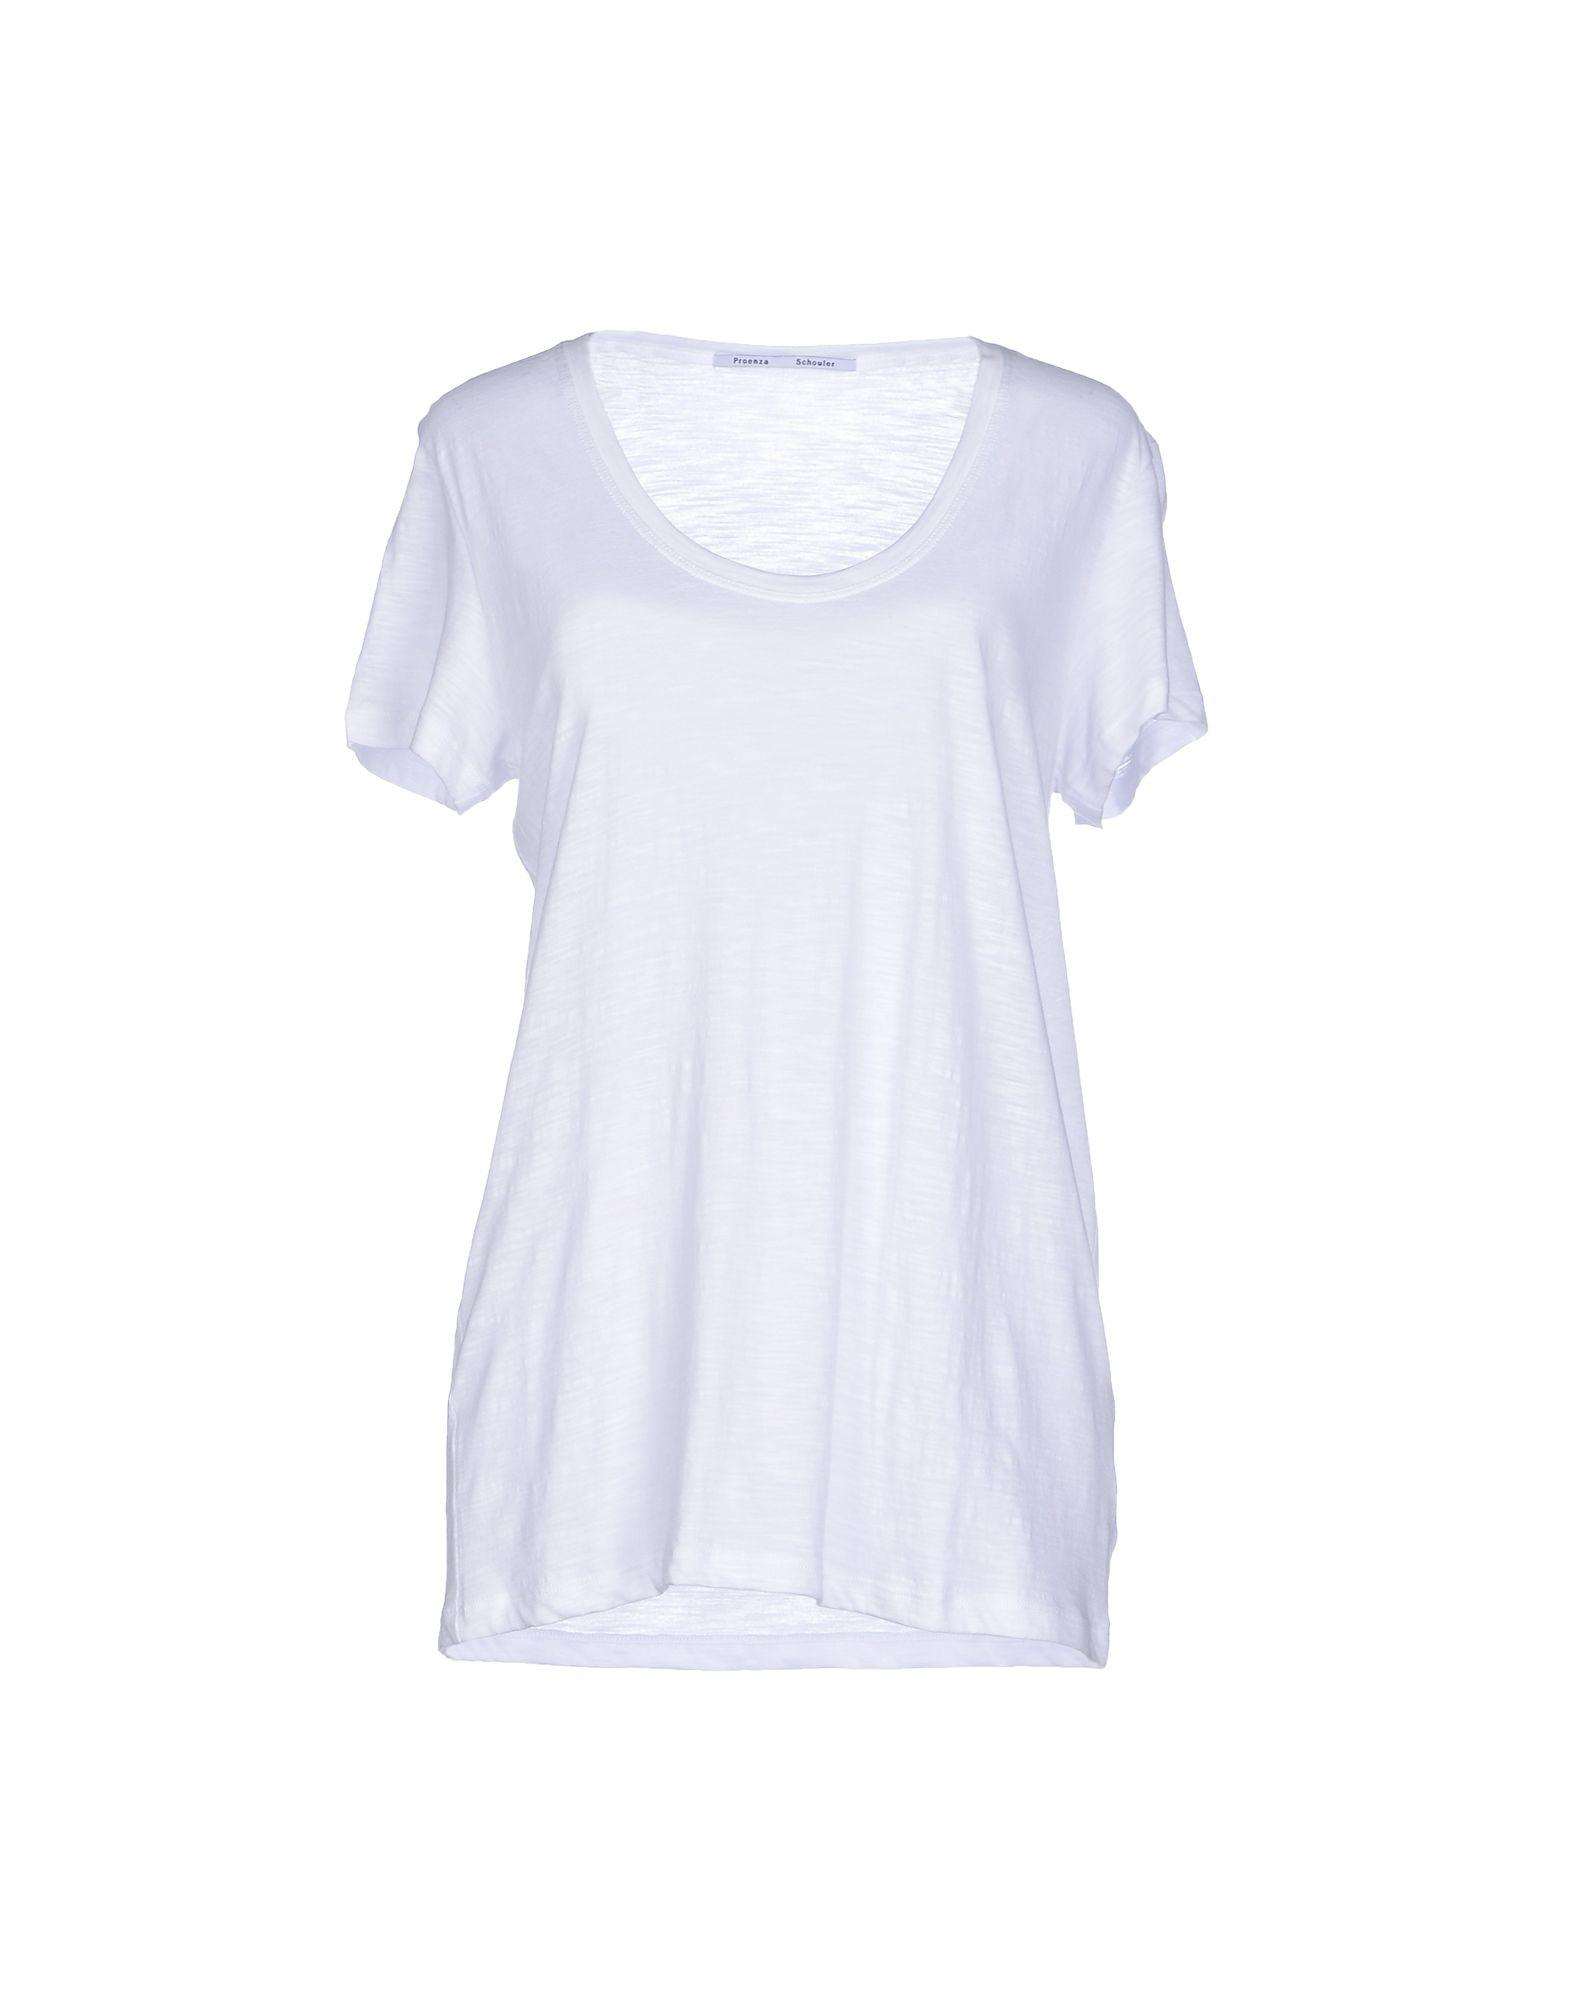 proenza schouler t shirt in white lyst